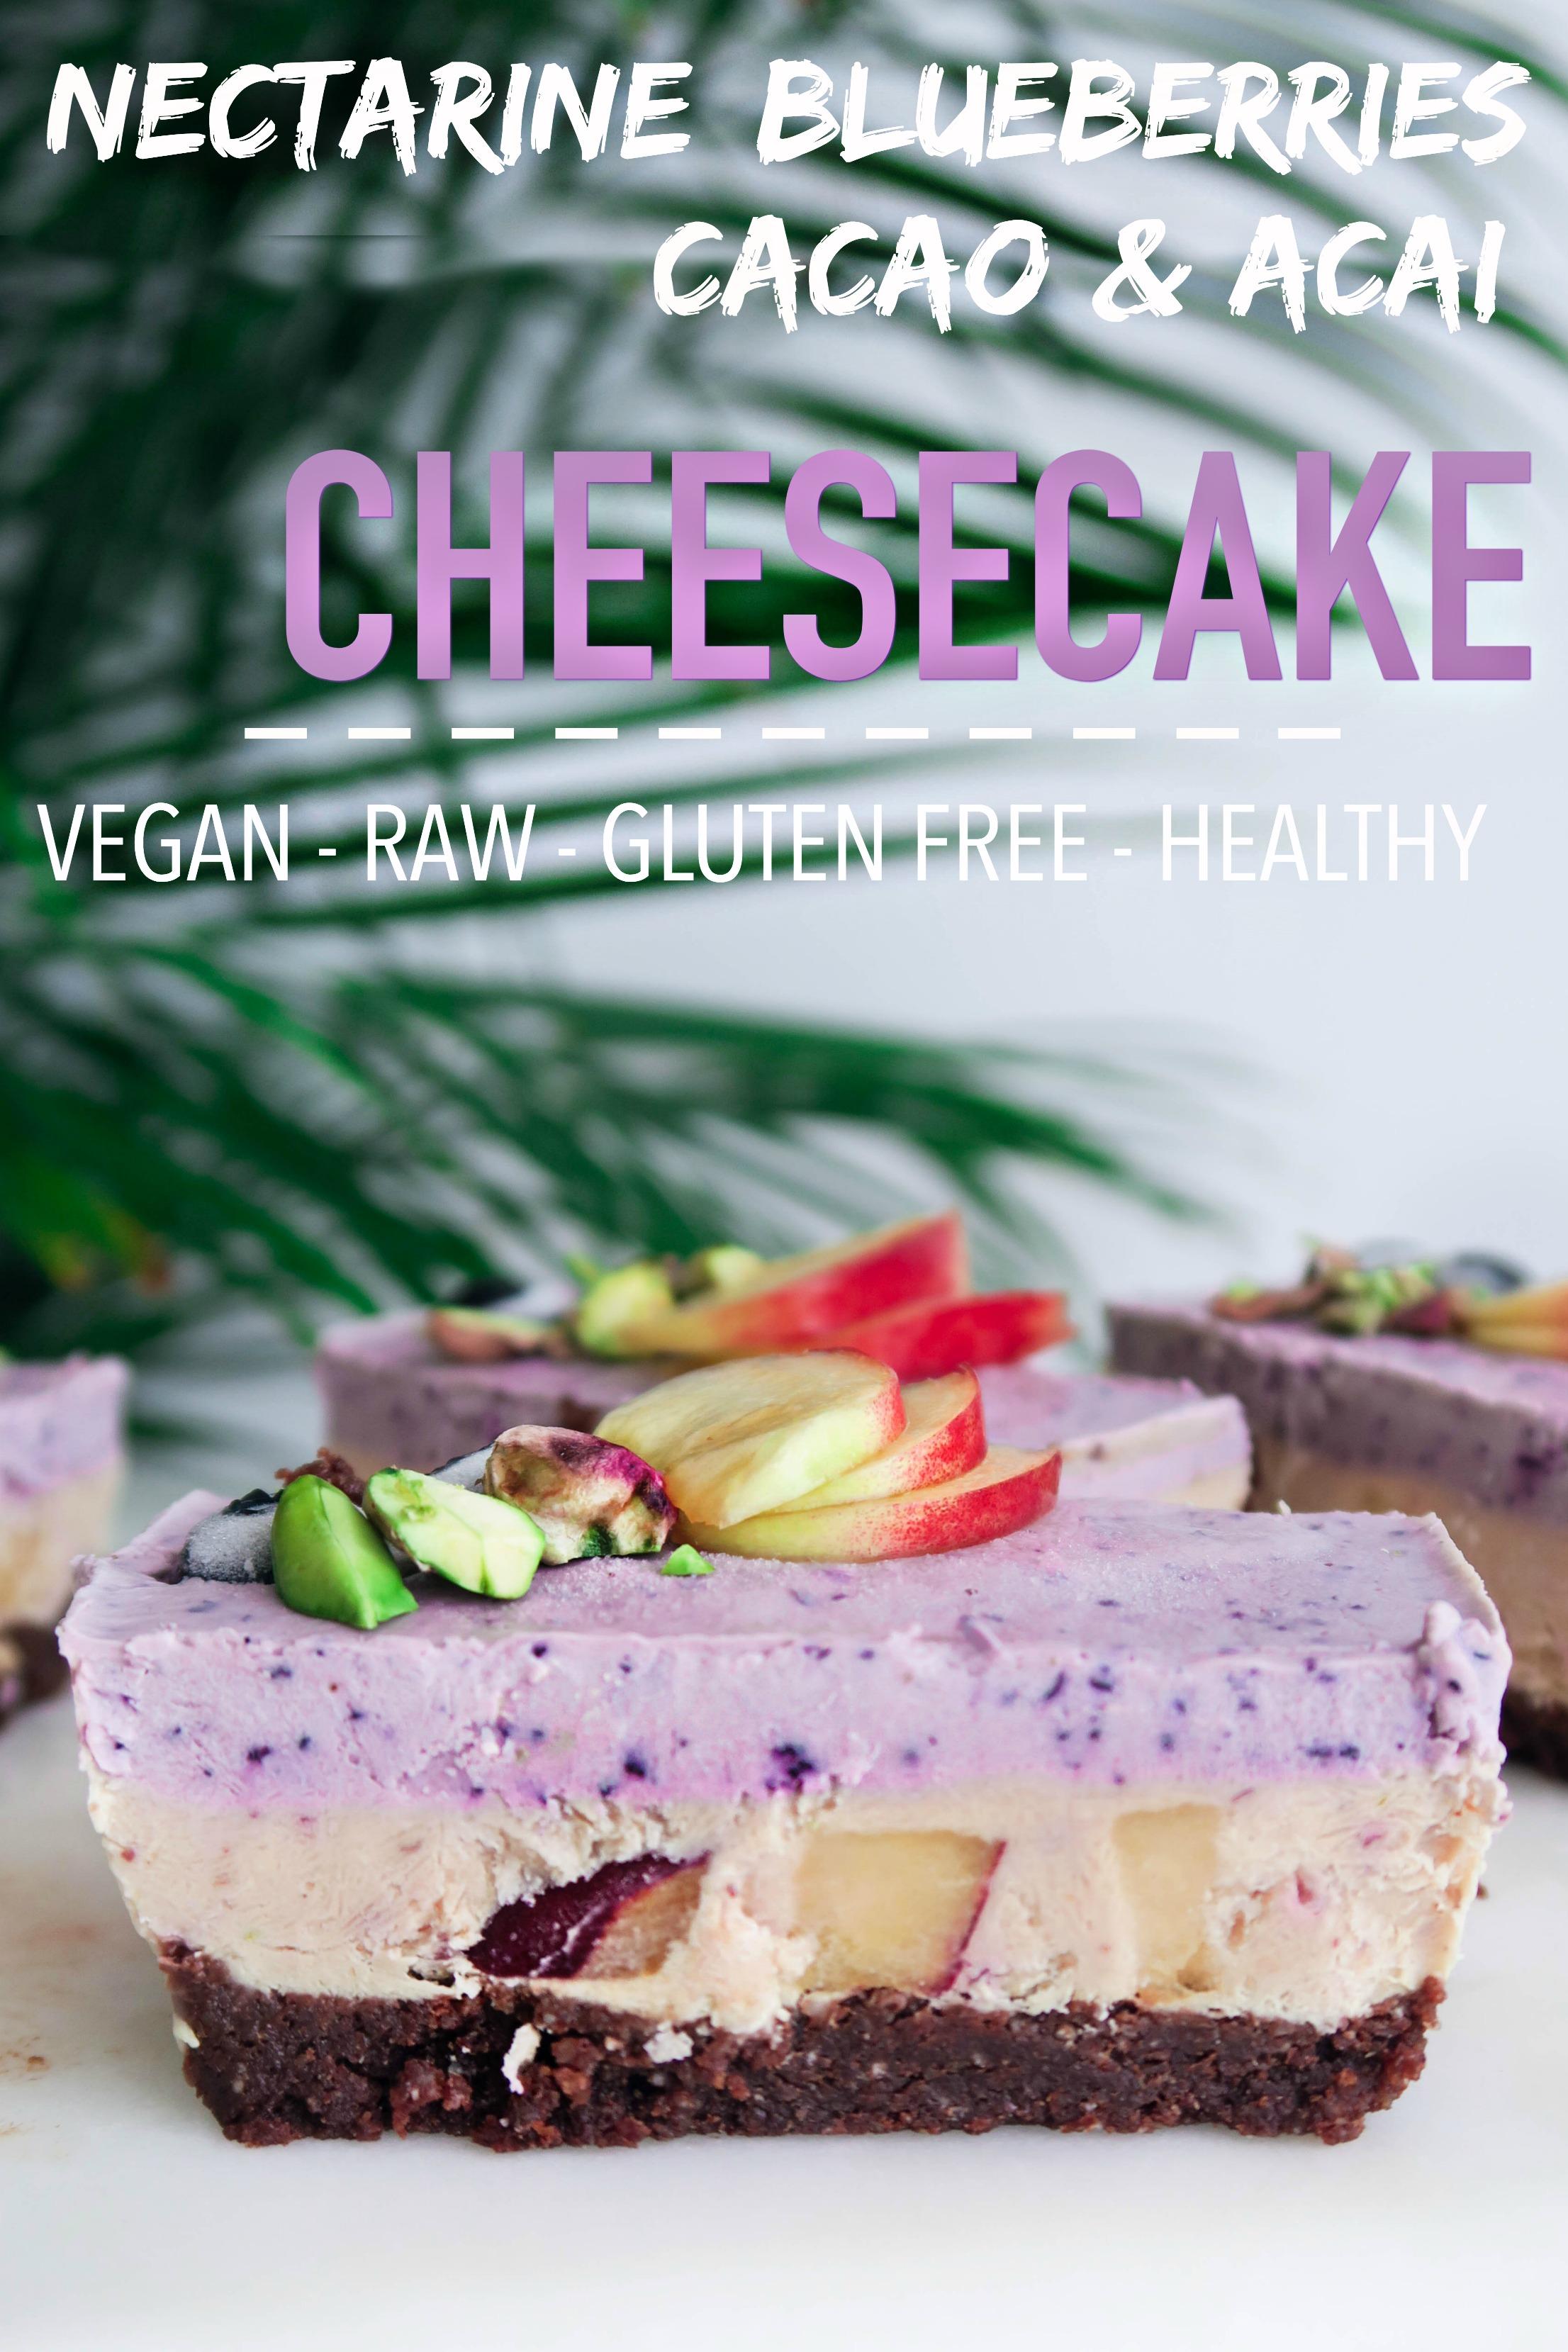 Nectarine, Blueberries, Acai & Cacao Cheesecake (Vegan, Raw, Gluten-Free, Healthy)